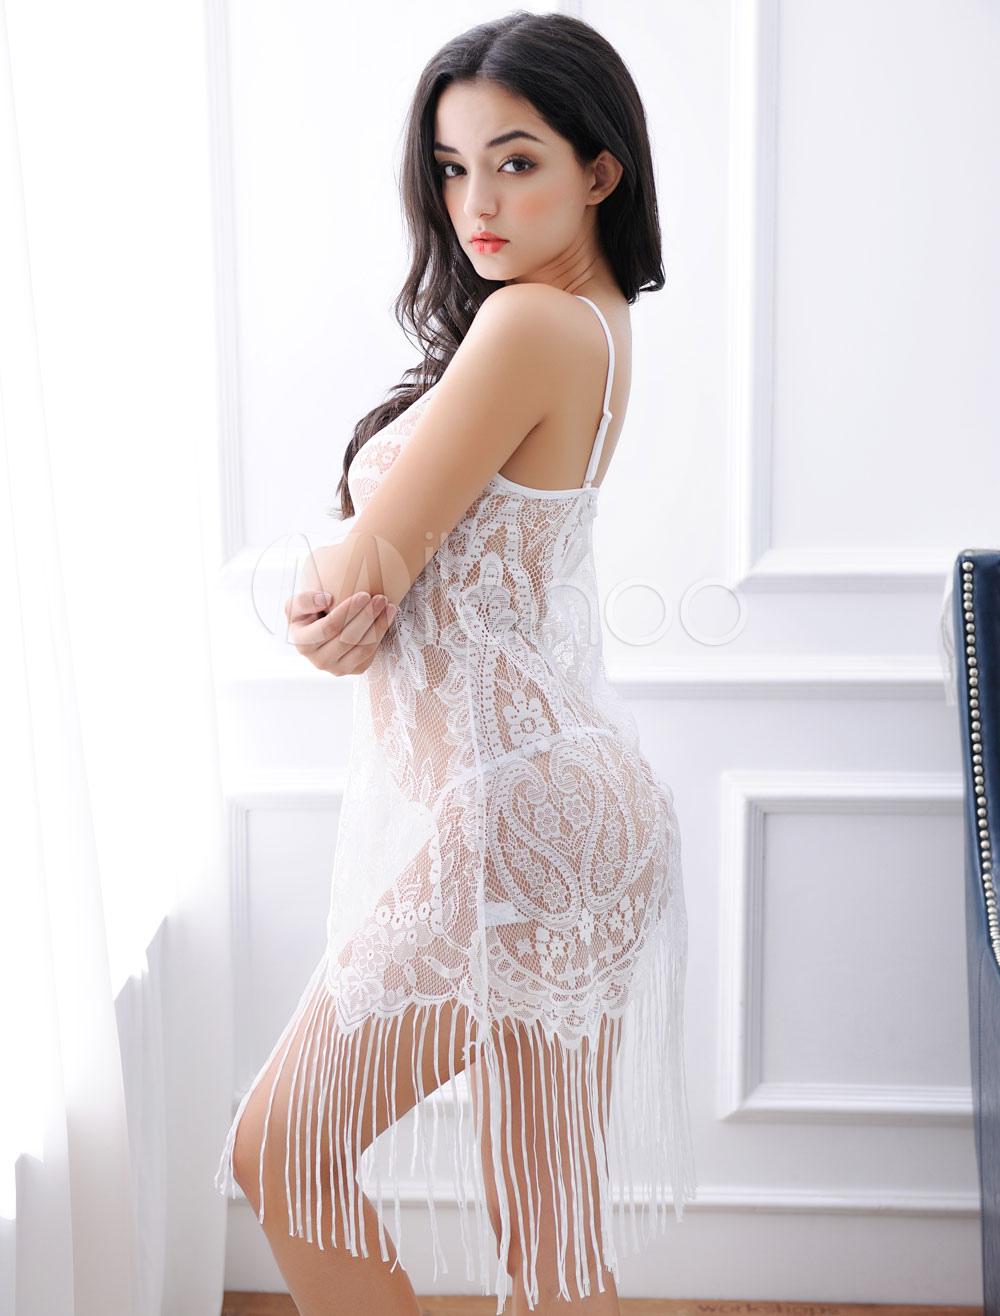 White Lace Babbydoll Set Sexy Fringe Semi Sheer Mini Dress Lingerie And T Back